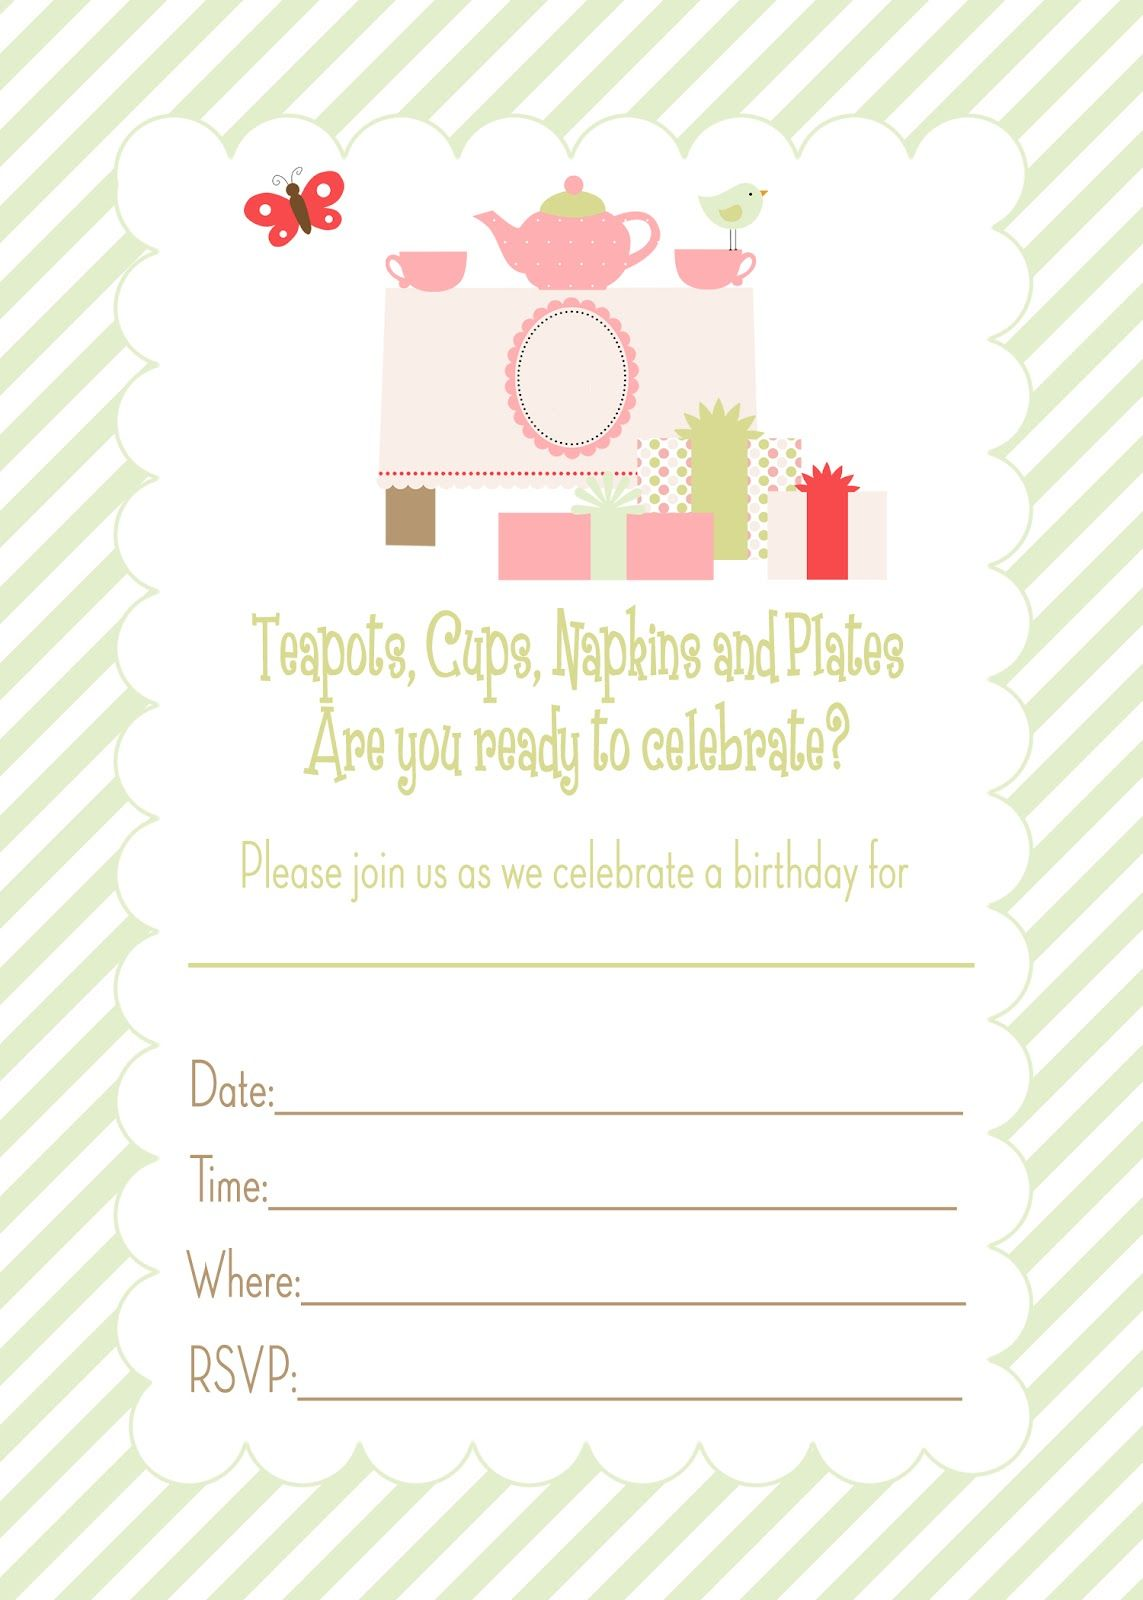 Free Printable Tea Party Birthday Invitation, Go To Www Likegossip